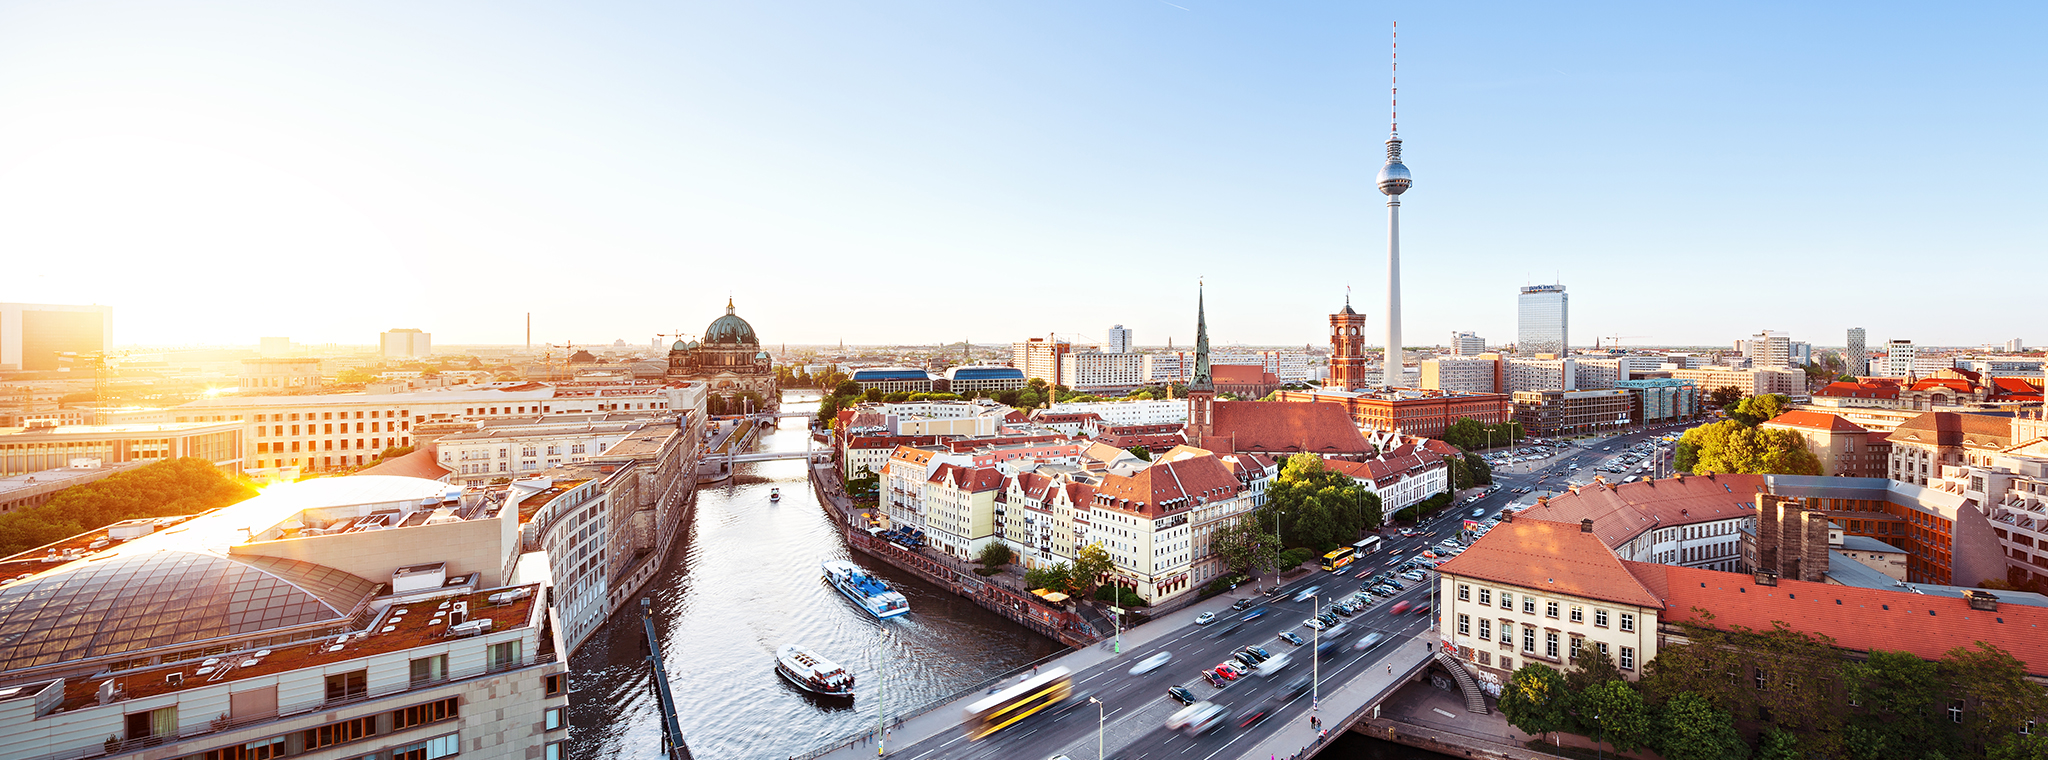 Berlin Postbank Immobilien Der Immobilienmakler der